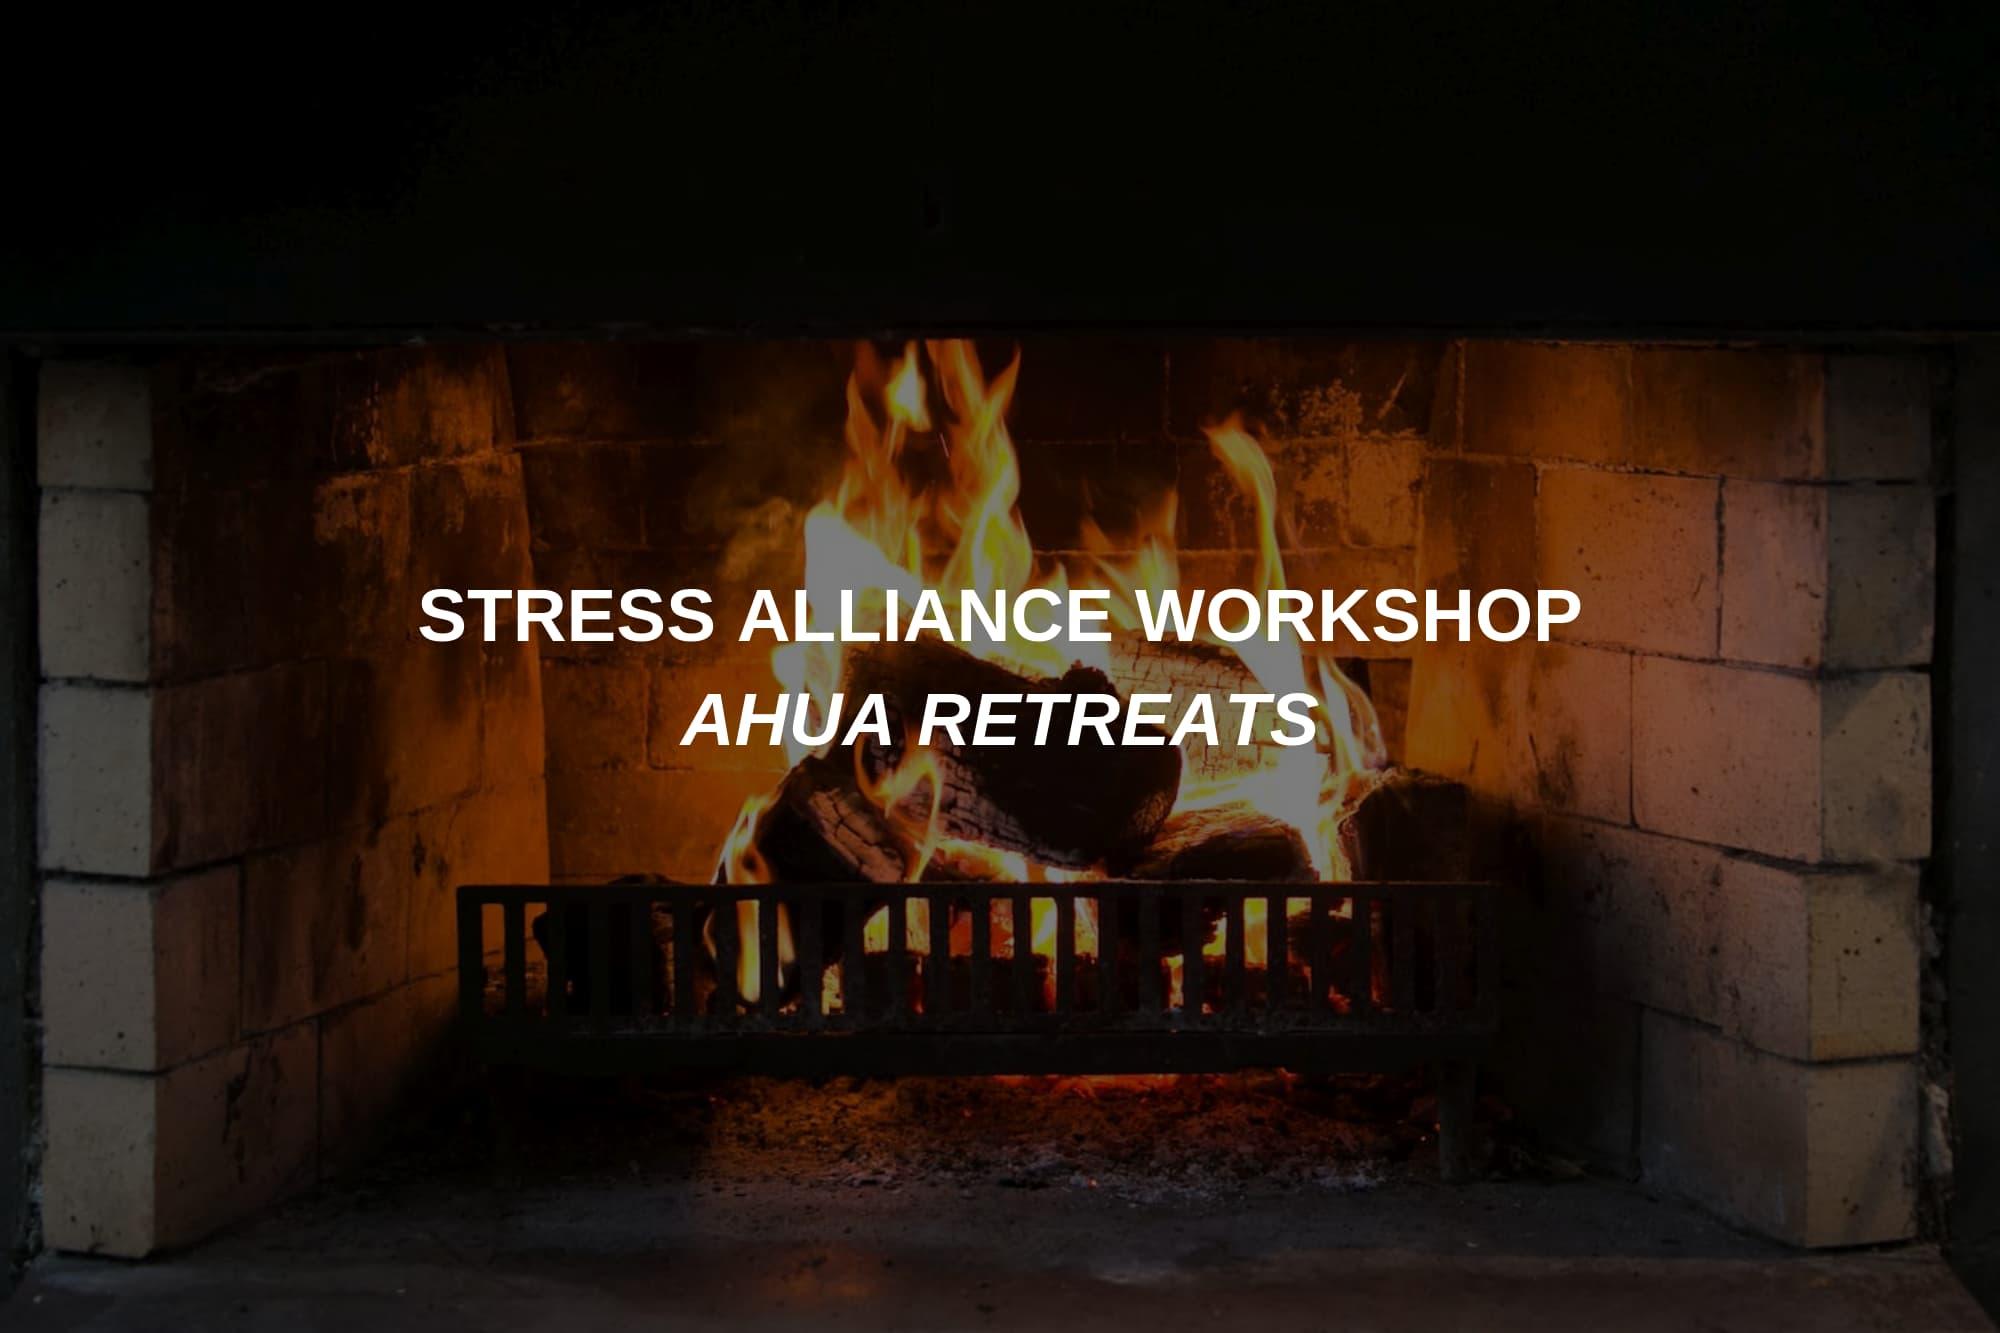 STRESS ALLIANCE WORKSHOP, AHUA RETREATS (1).jpg